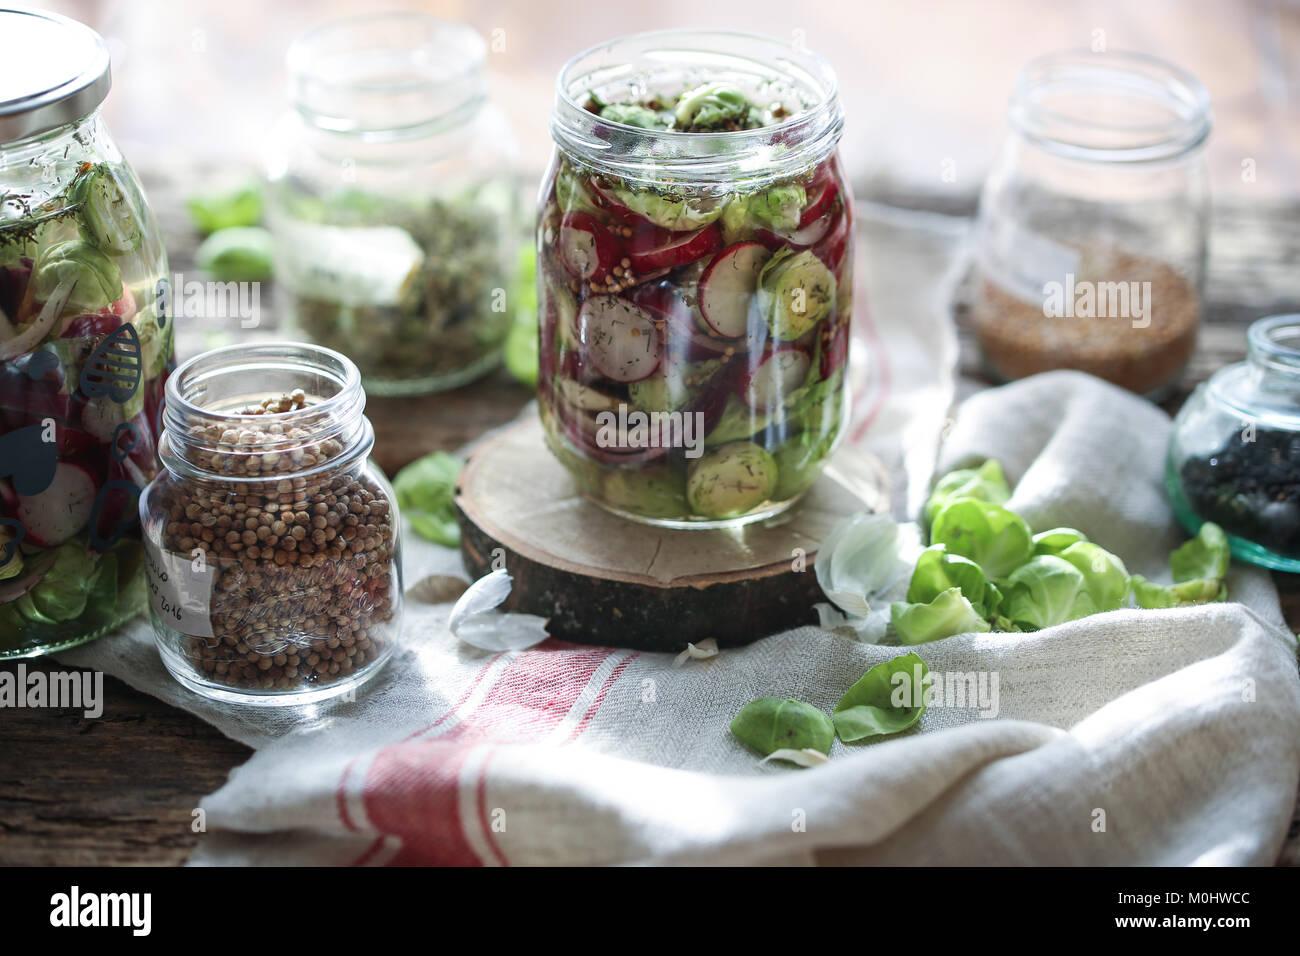 Jar full of homemade fermented veggies. - Stock Image